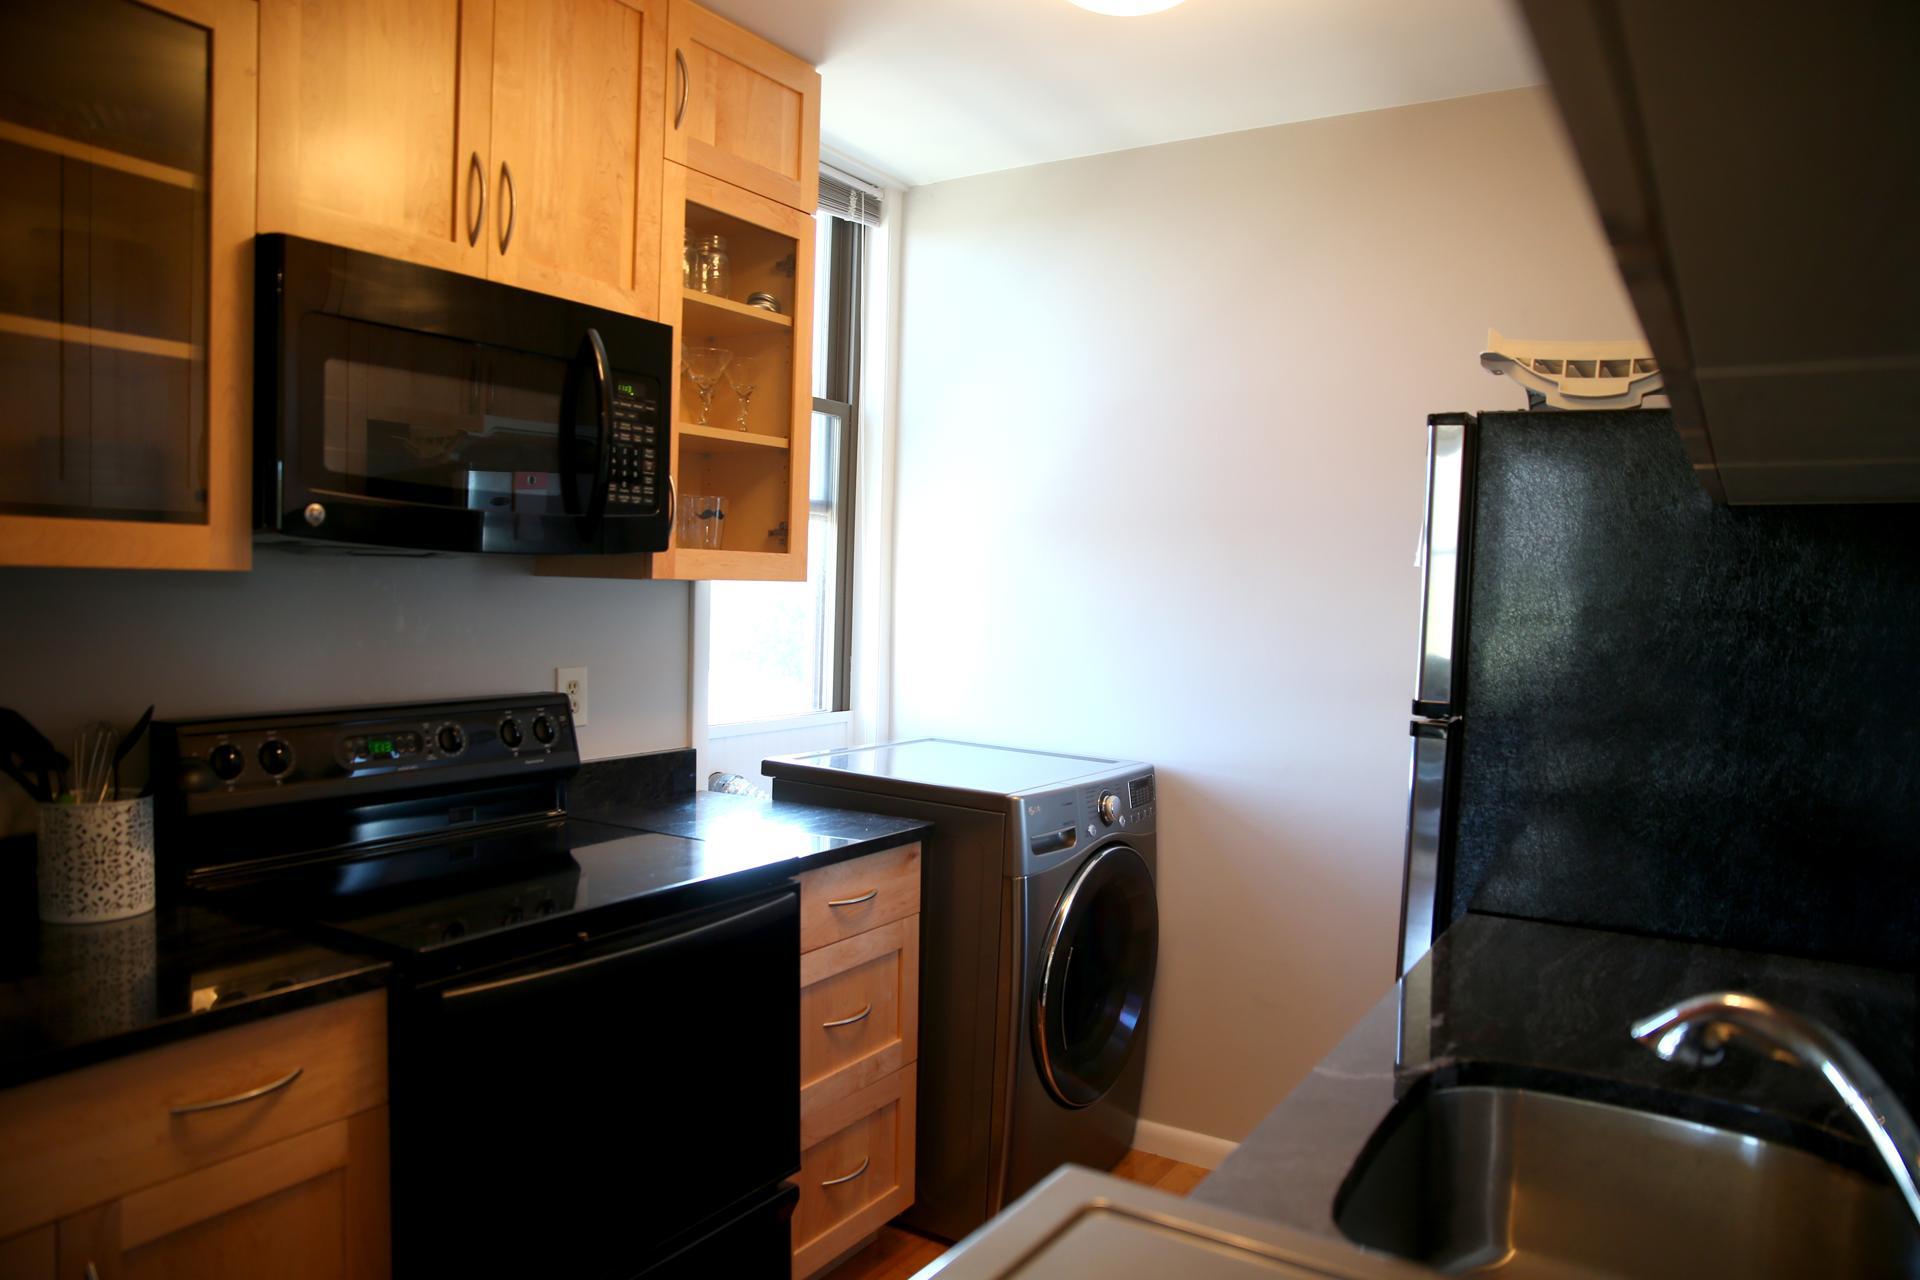 Uncategorized Kitchen Appliances Brighton two story condo in penthouse tower overlooks brighton the boston details